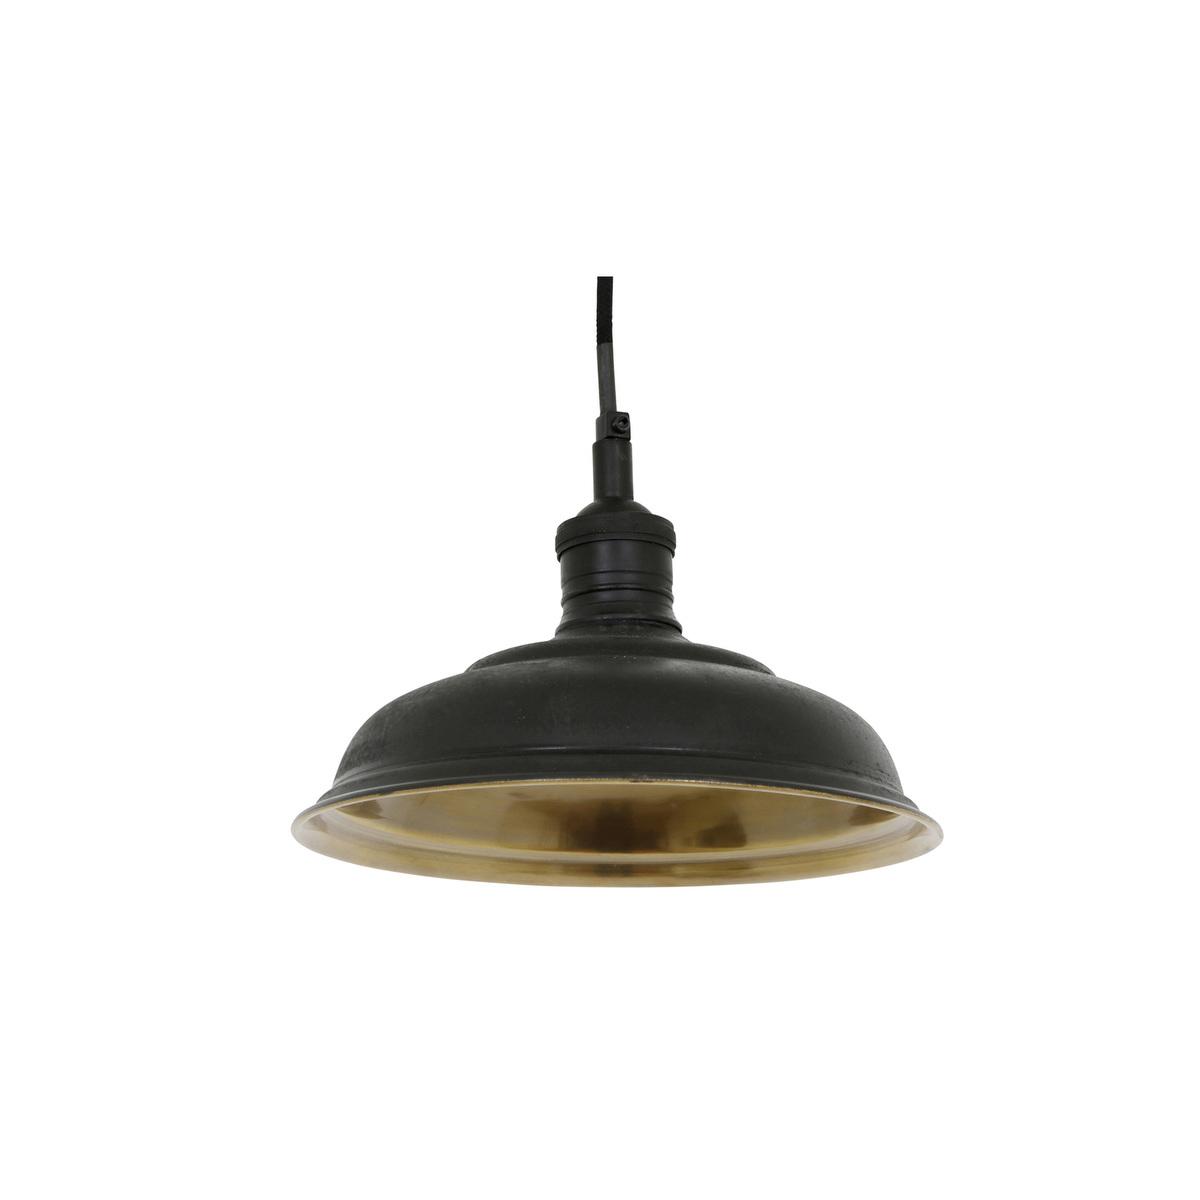 Ducasse Small Hanglamp Antiek Zwart